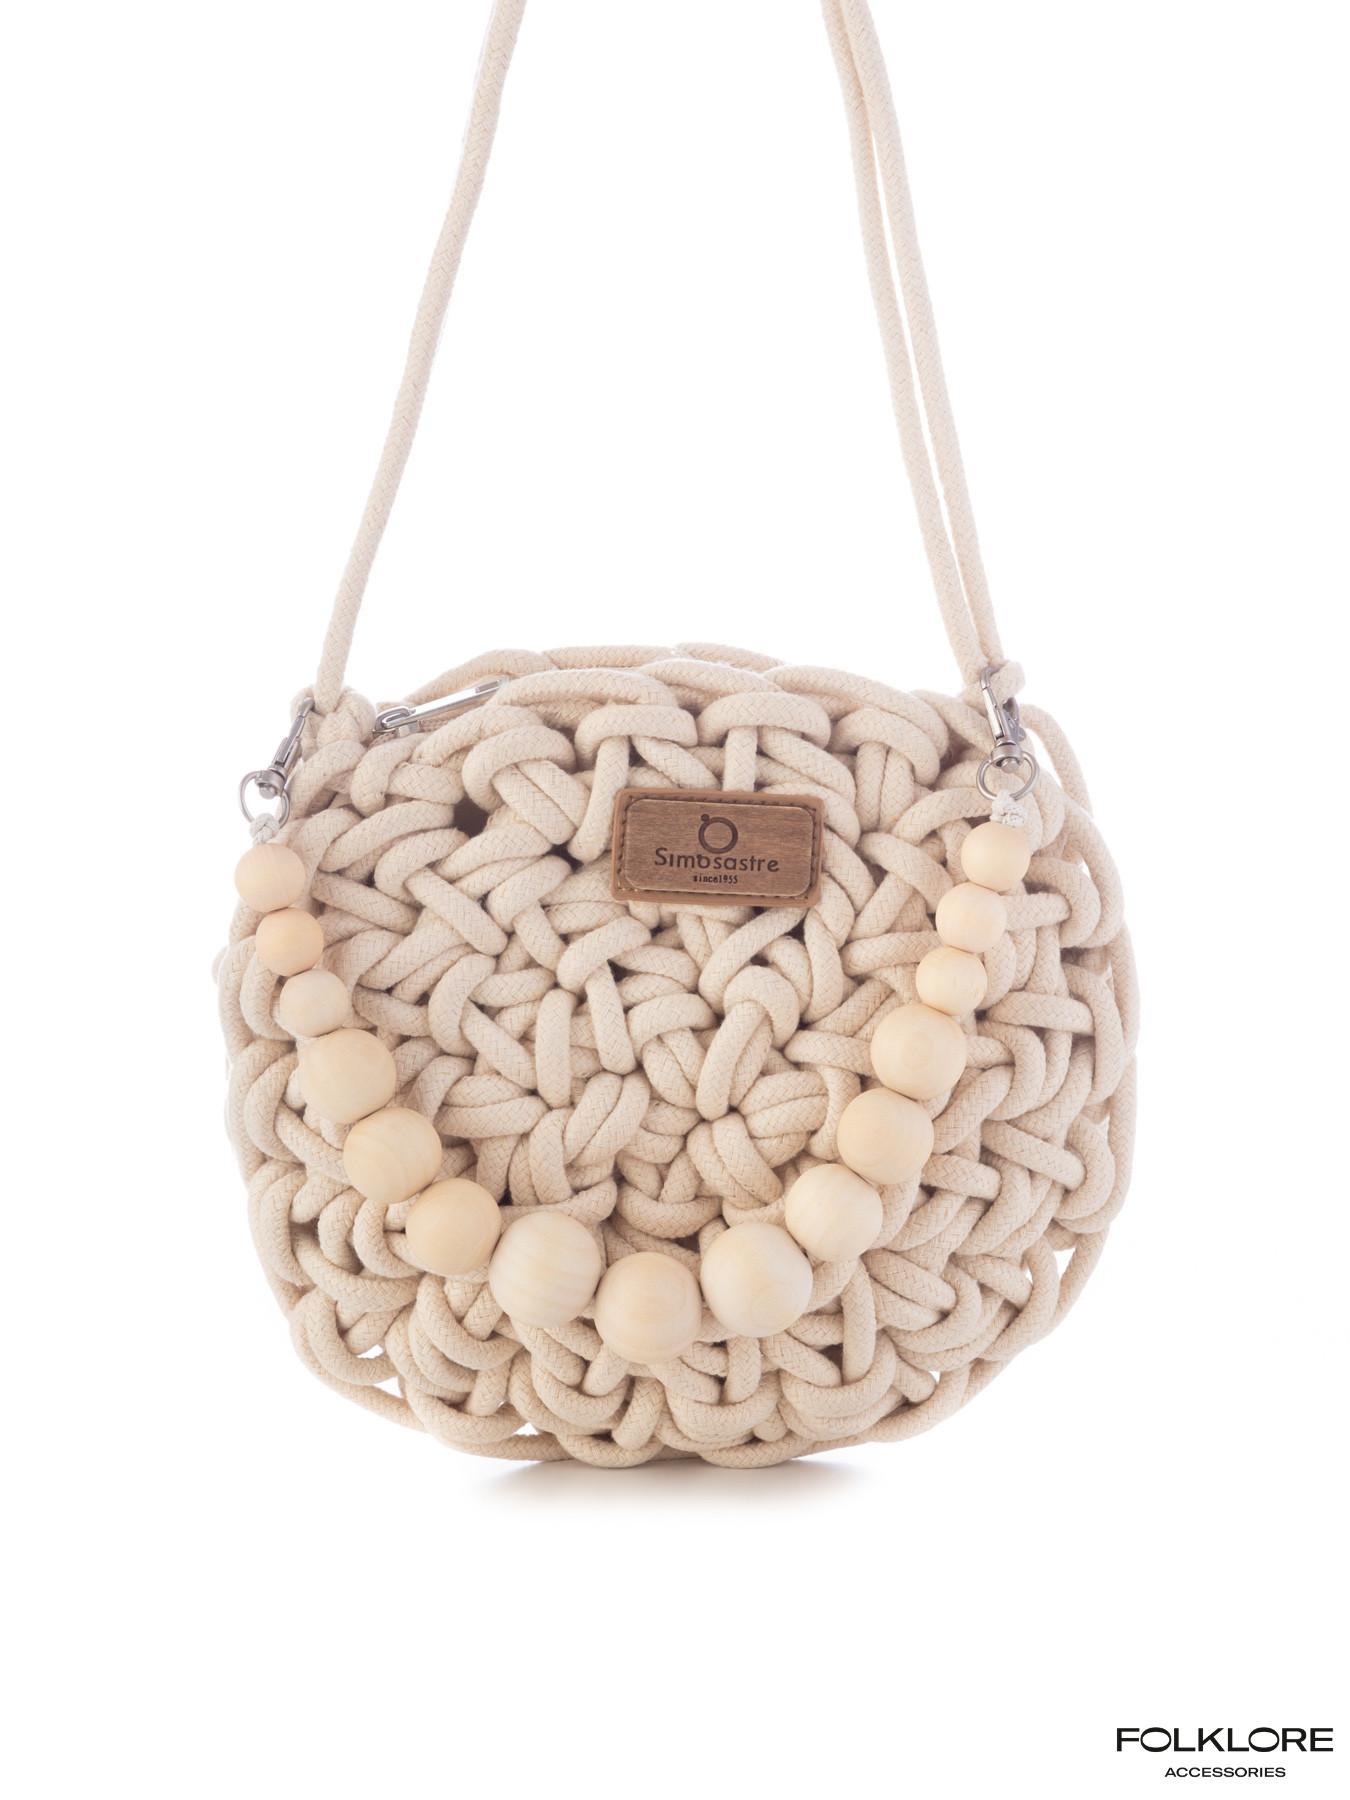 SIMOSASTRE Tašnica sa drvenim kuglicama - 100% Vegan